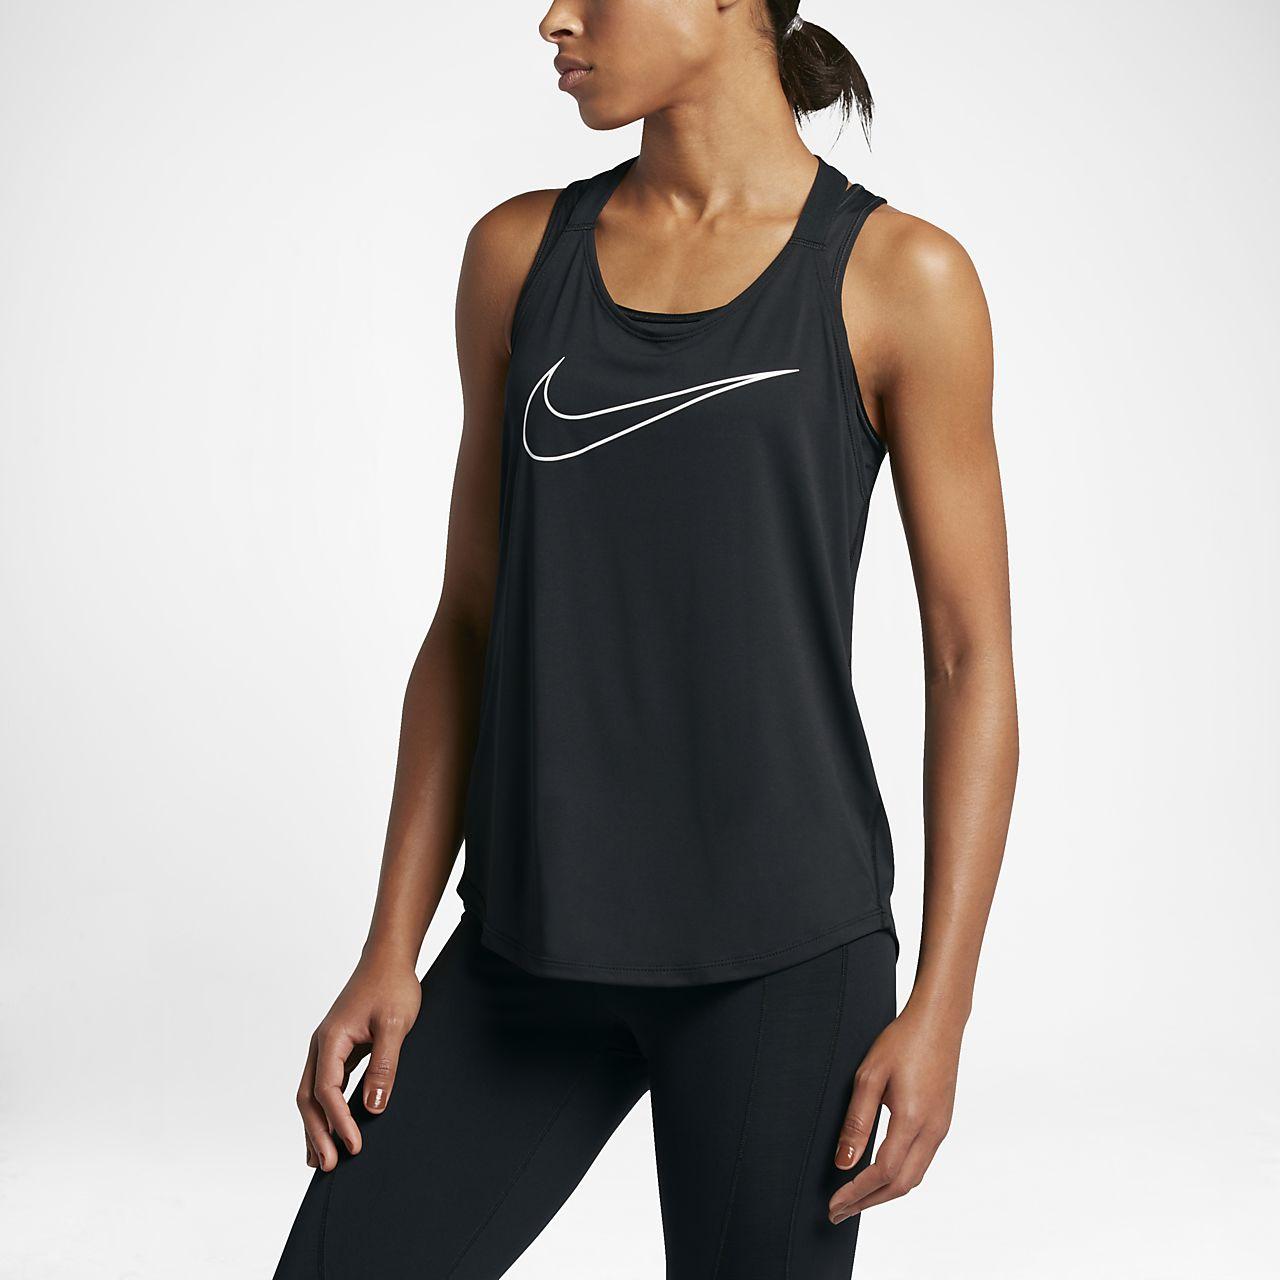 ... Nike Dry Women's Training Tank